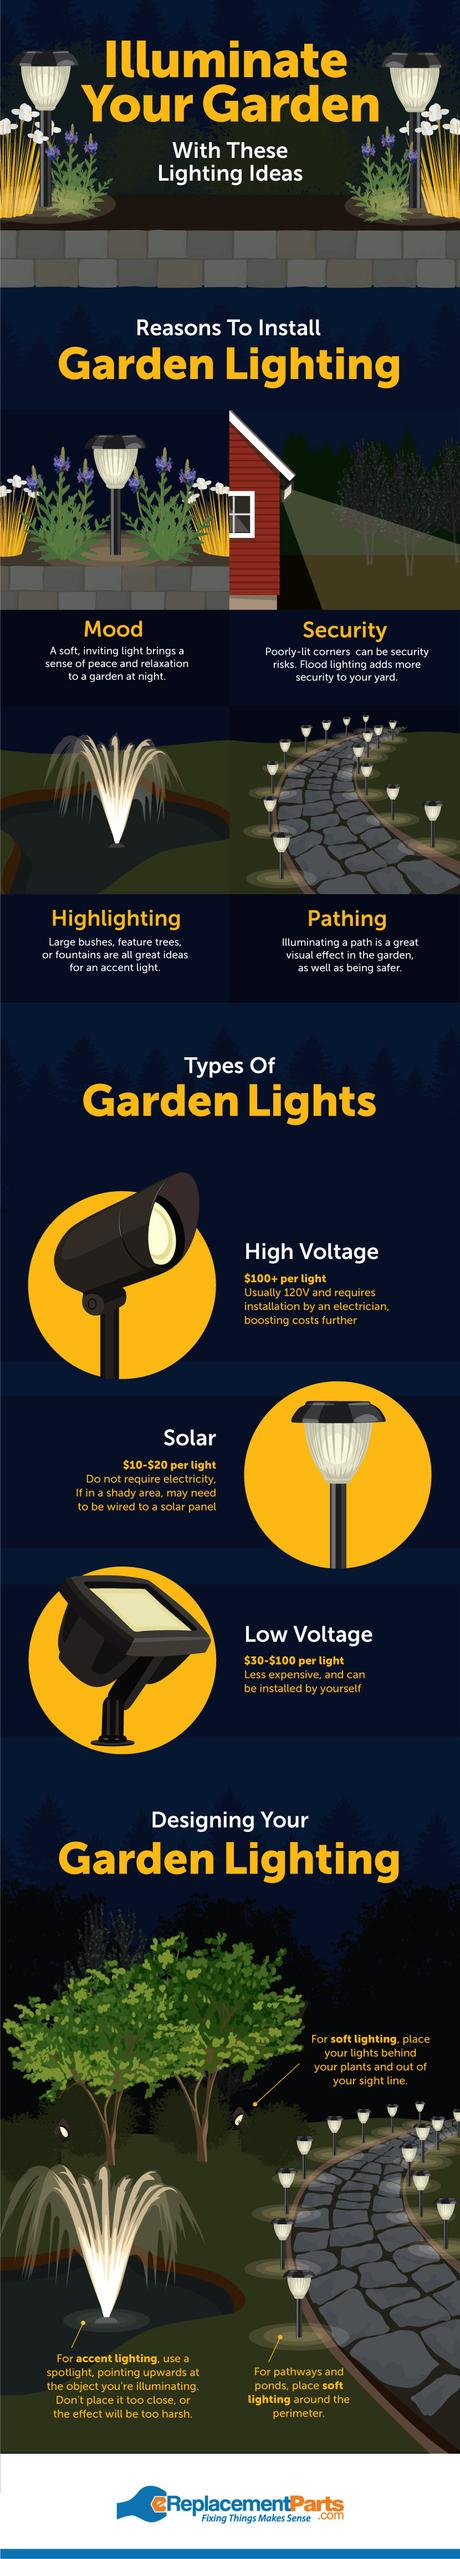 garden lighting infographic